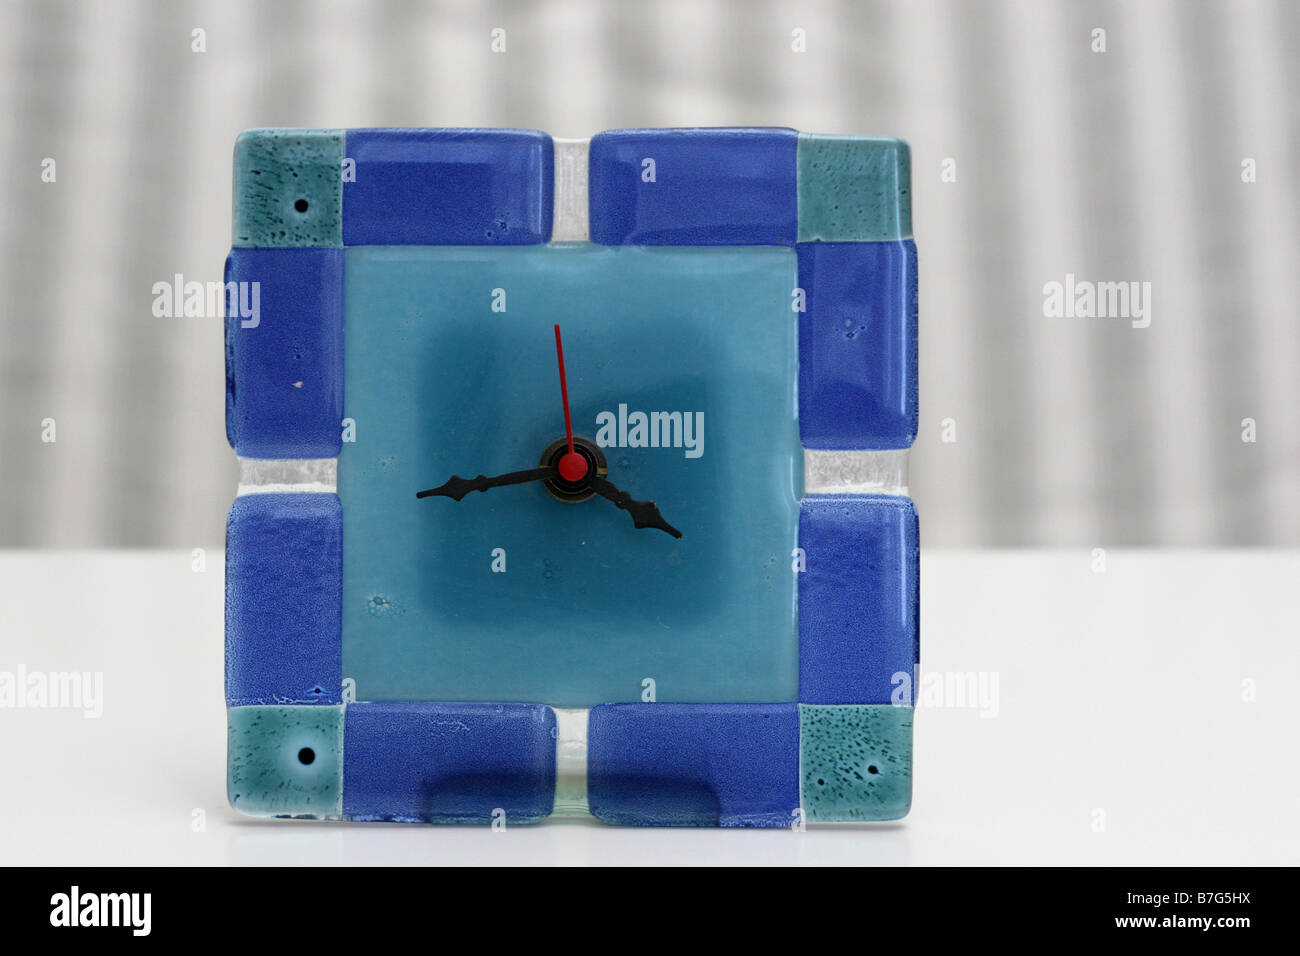 Blue analogue clock - Stock Image